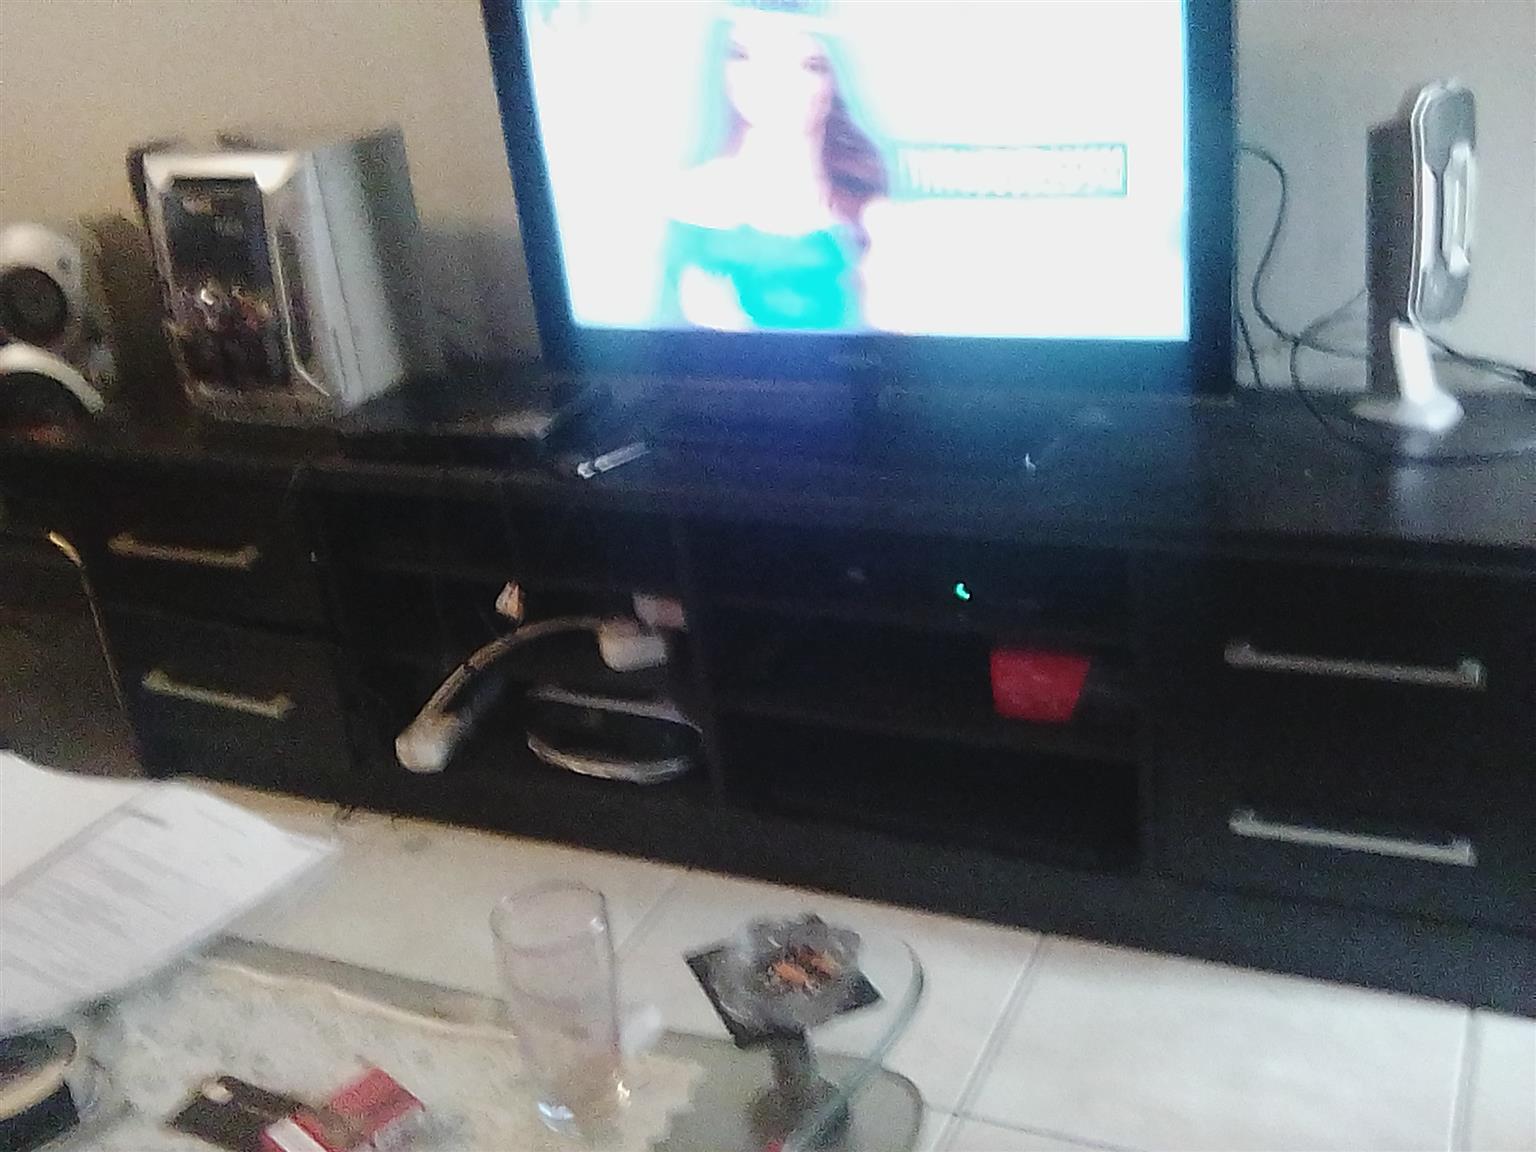 Samsung 32 inch flat screen HD